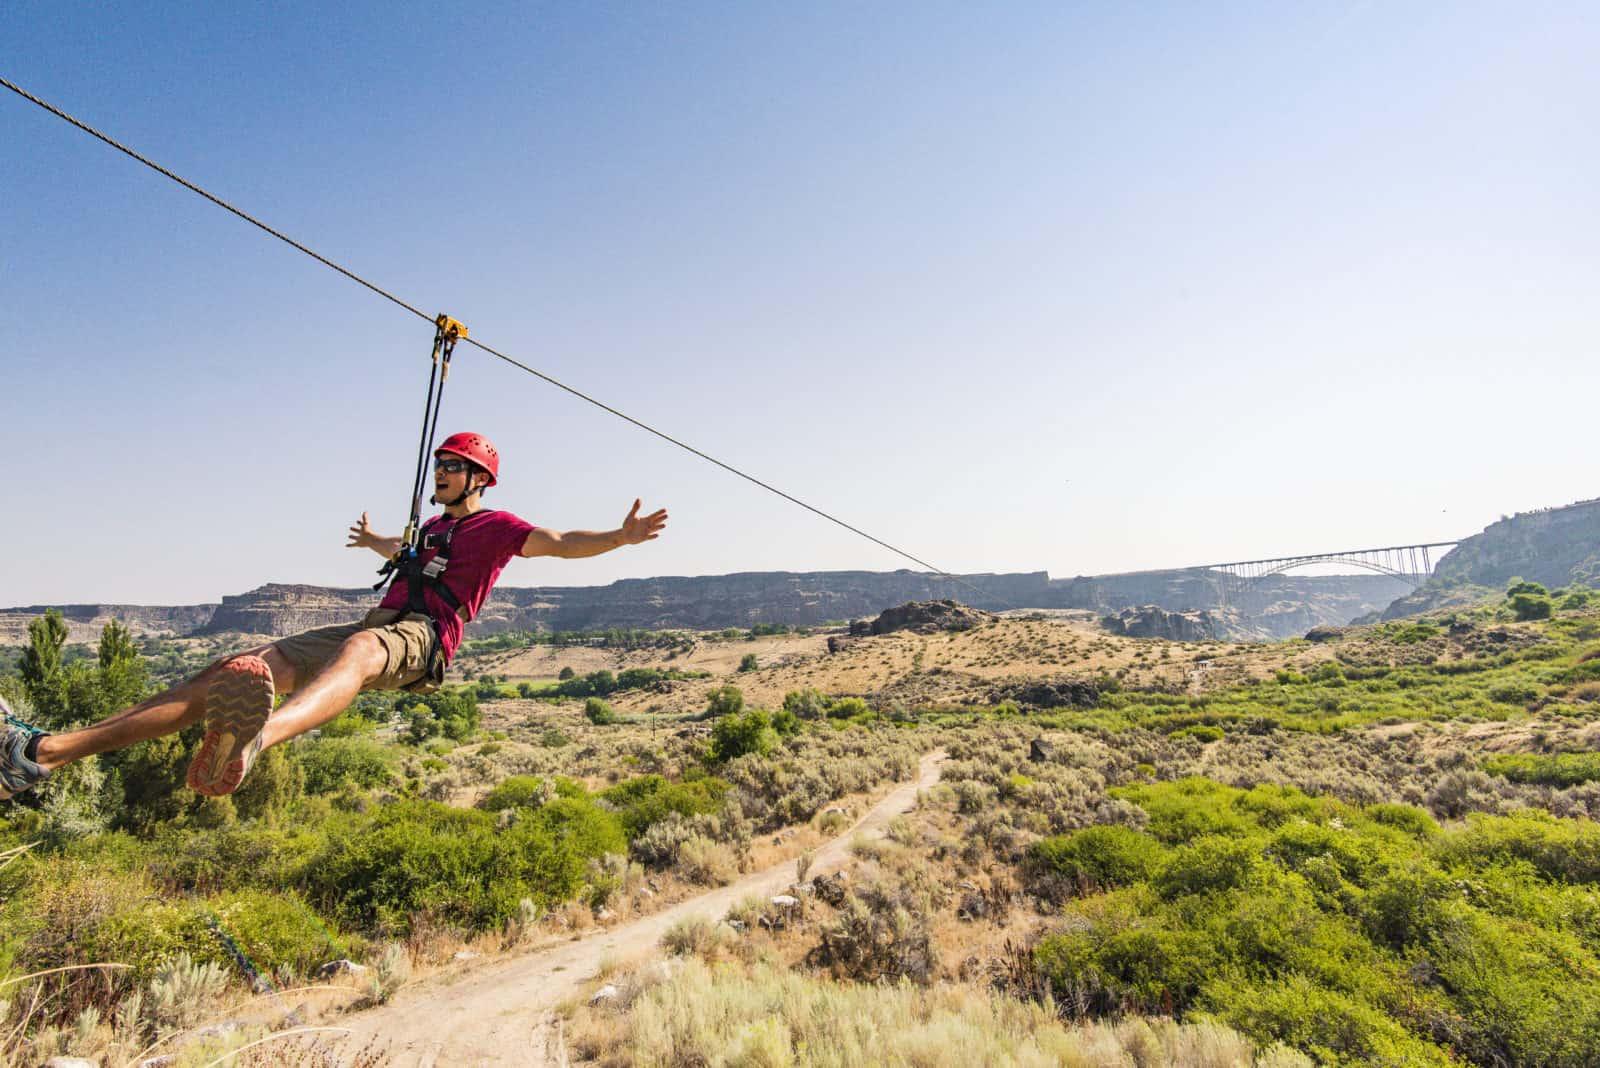 Man ziplining across a canyon